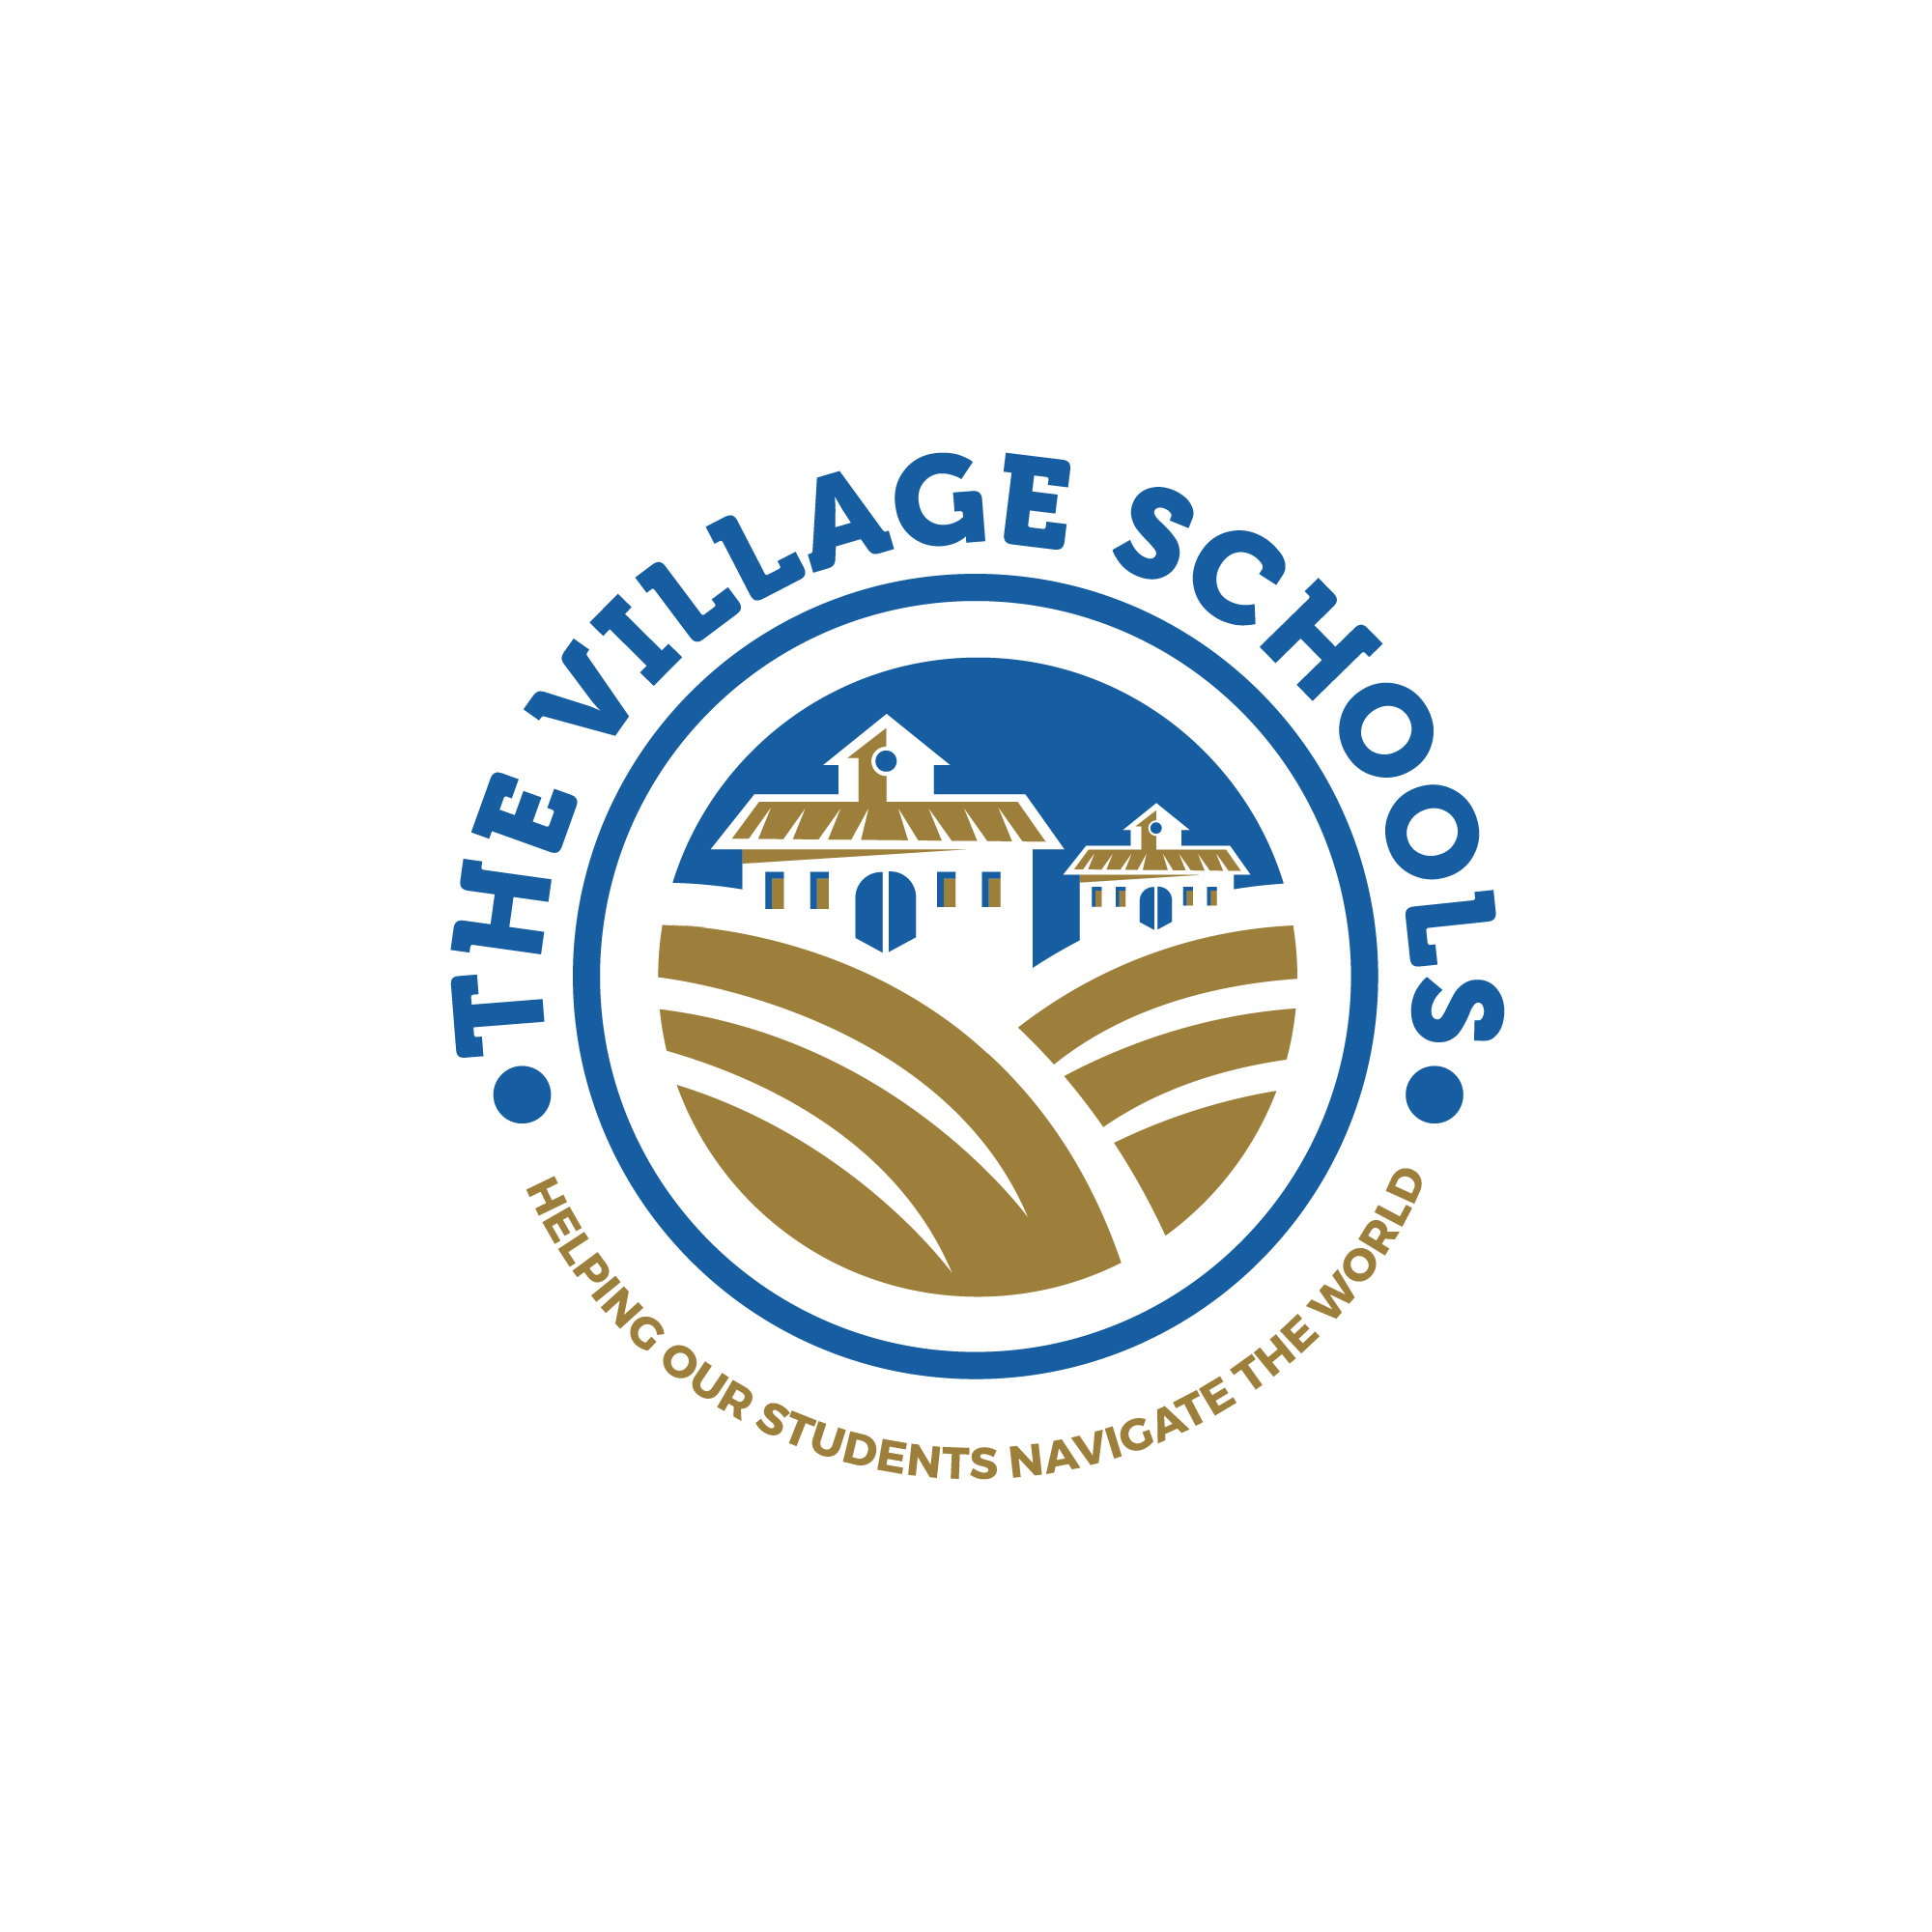 The Village School main logo